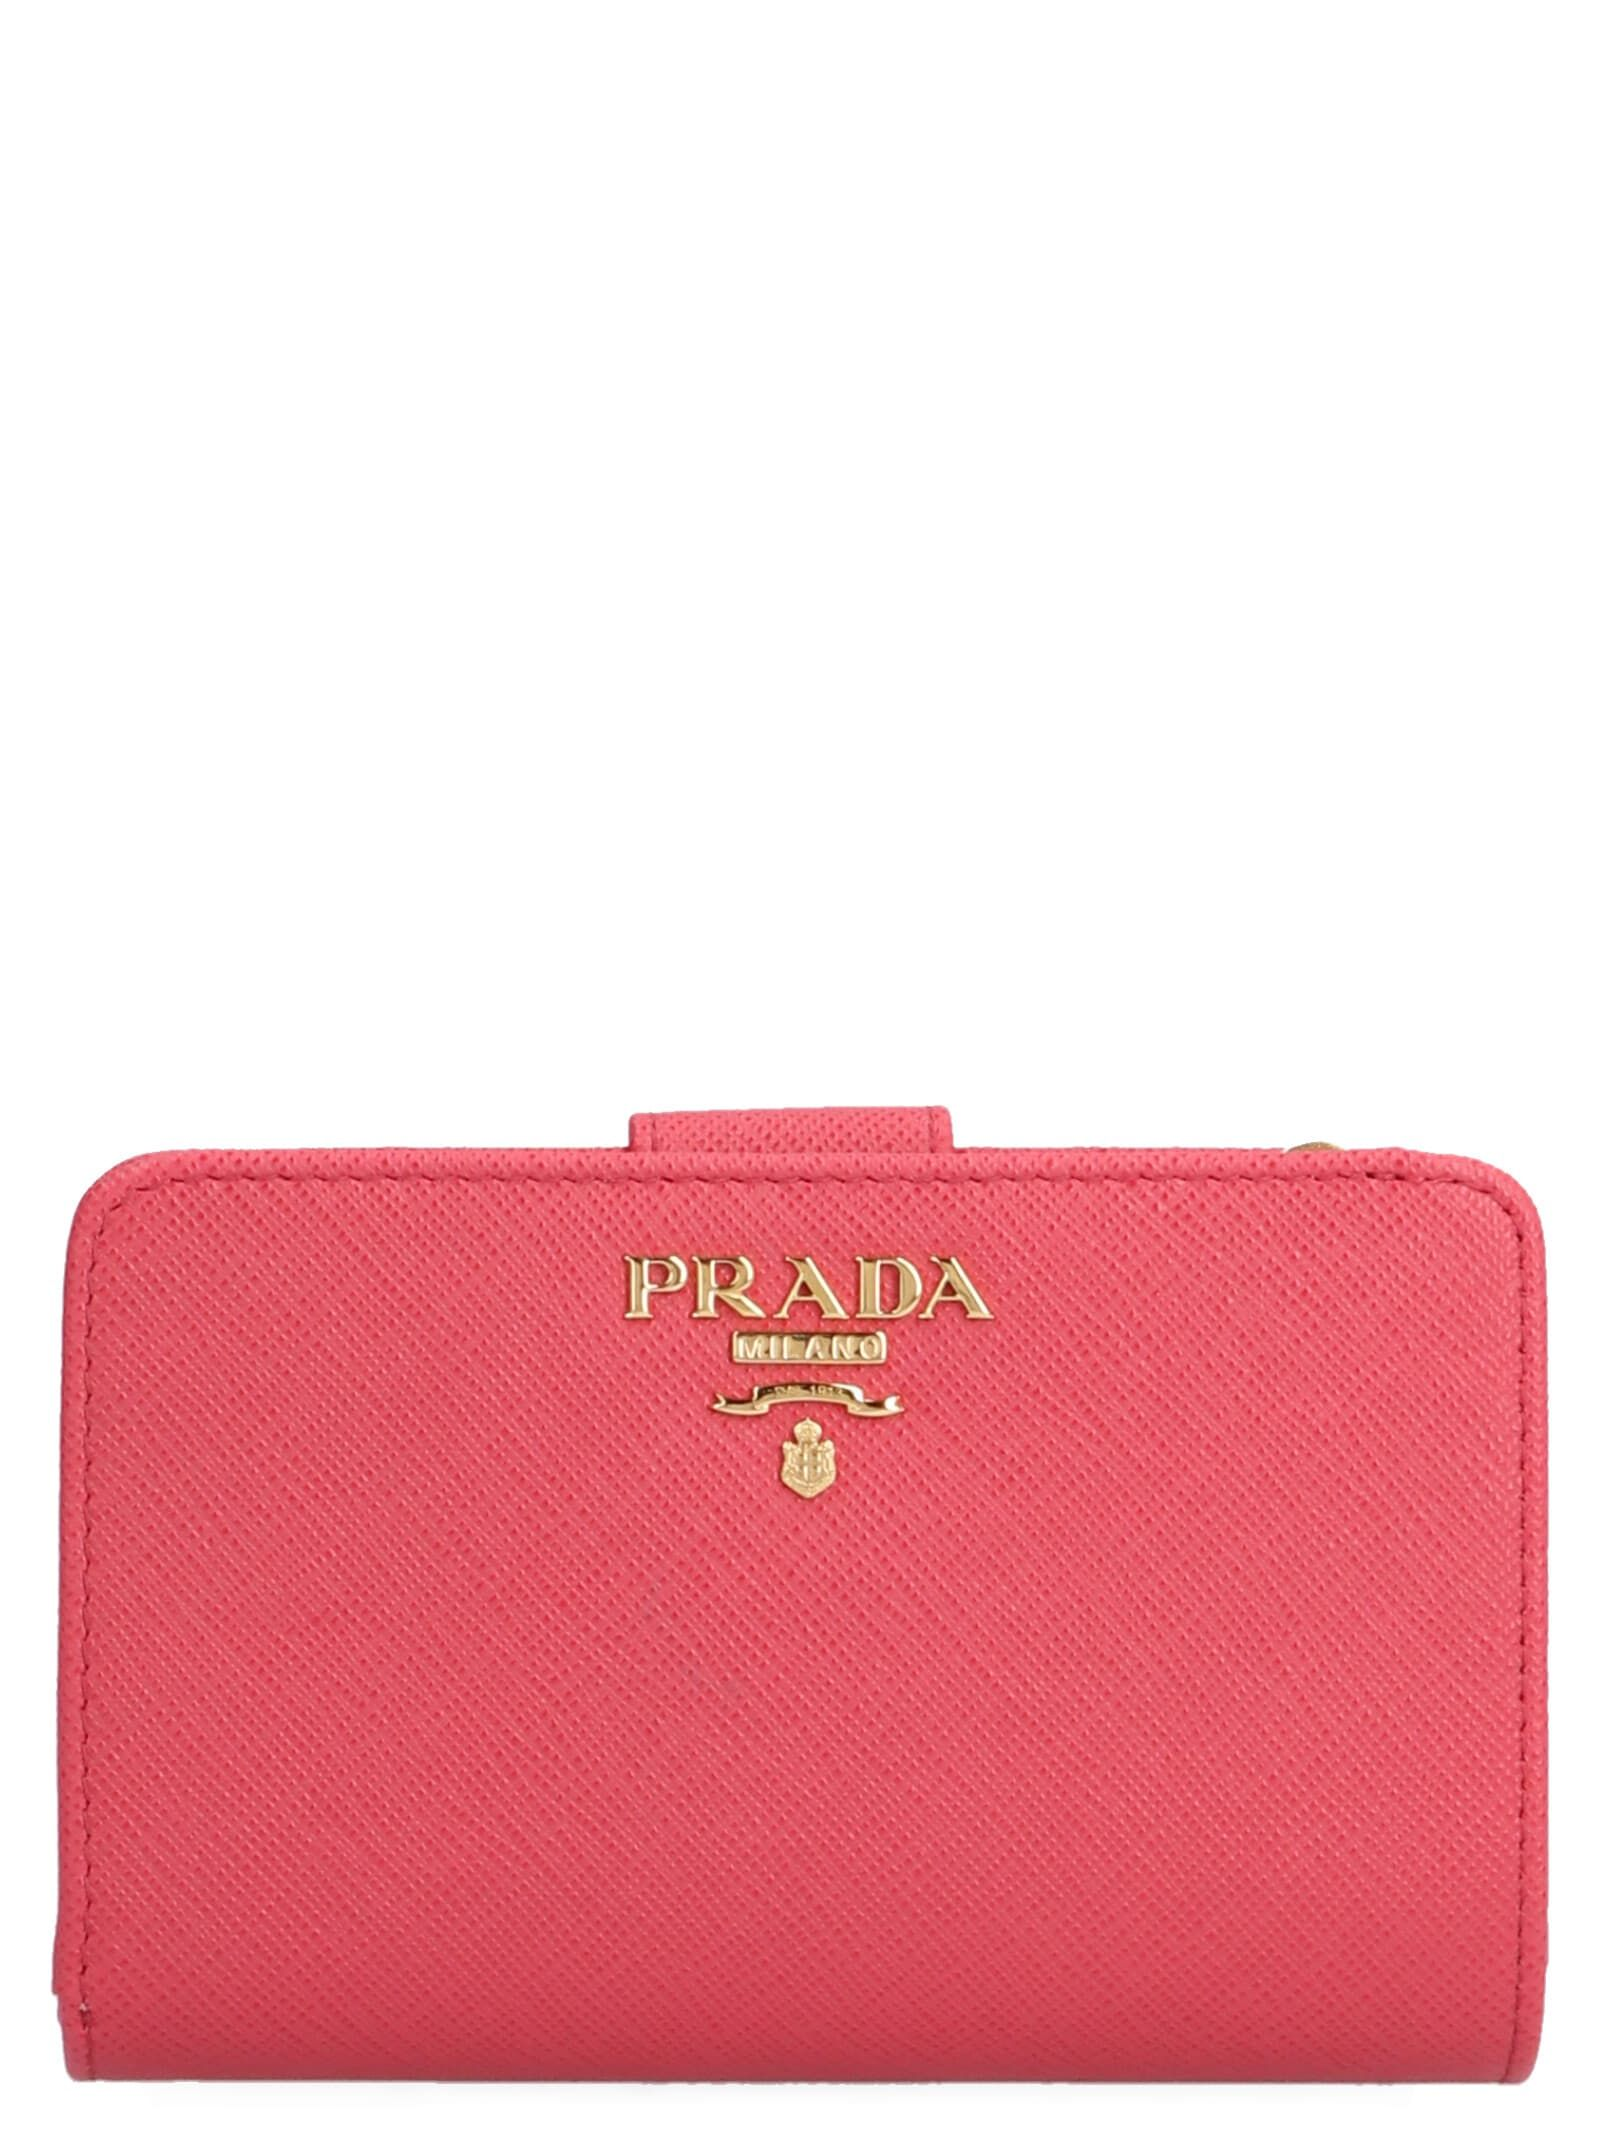 Prada wallet prada bags prada wallet wallet prada